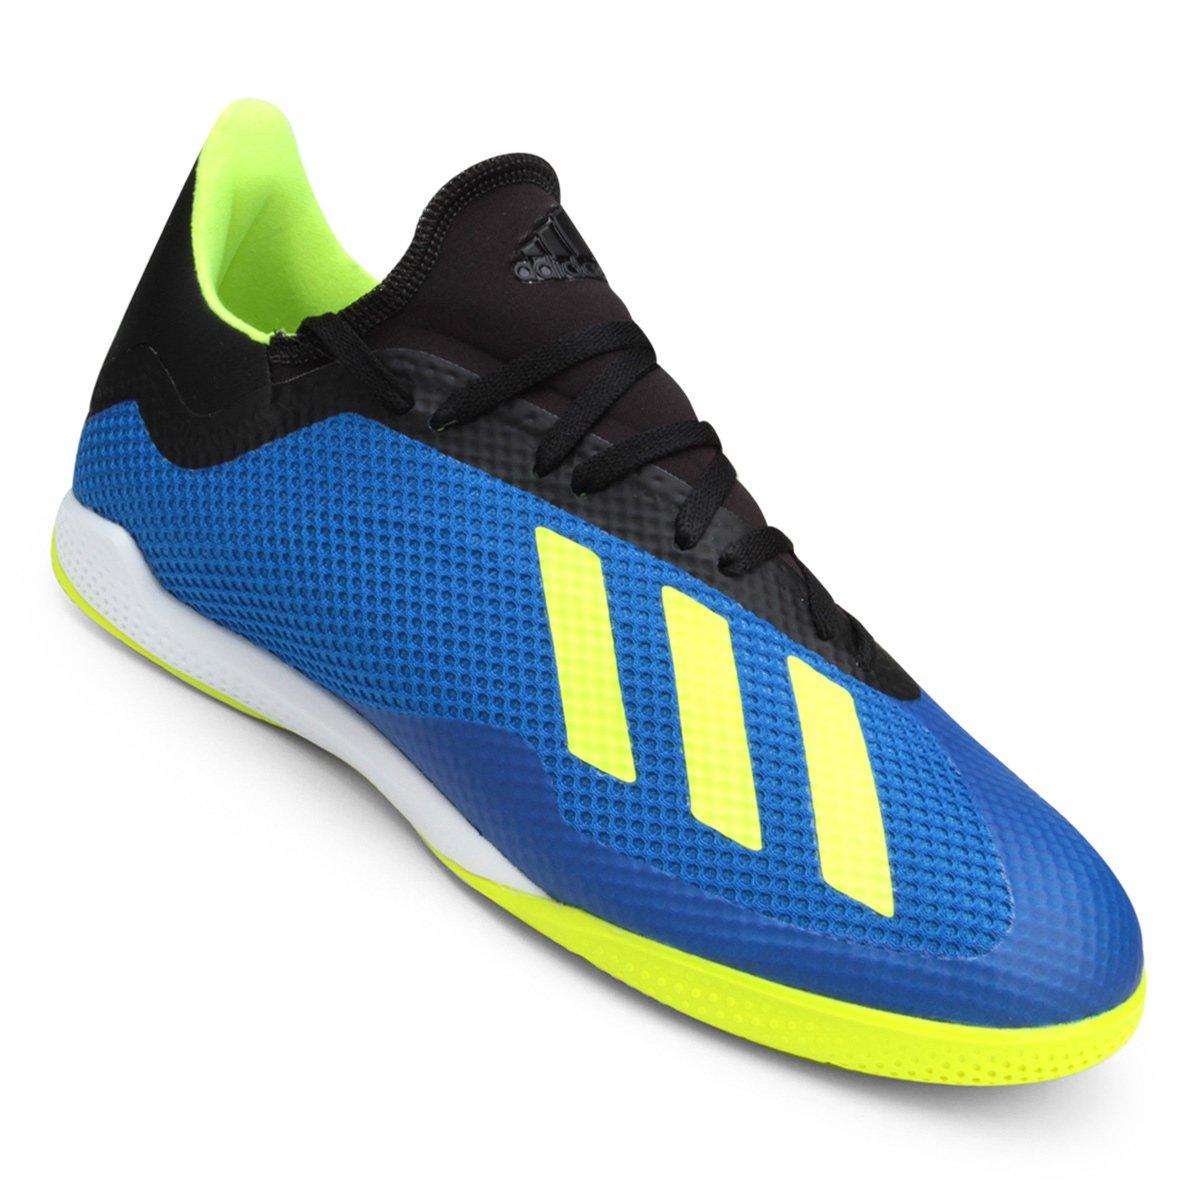 ae8c02e315eb1 Chuteira futsal adidas tango in azul e amarelo compre jpg 544x544 Tenis chuteira  adidas masculino